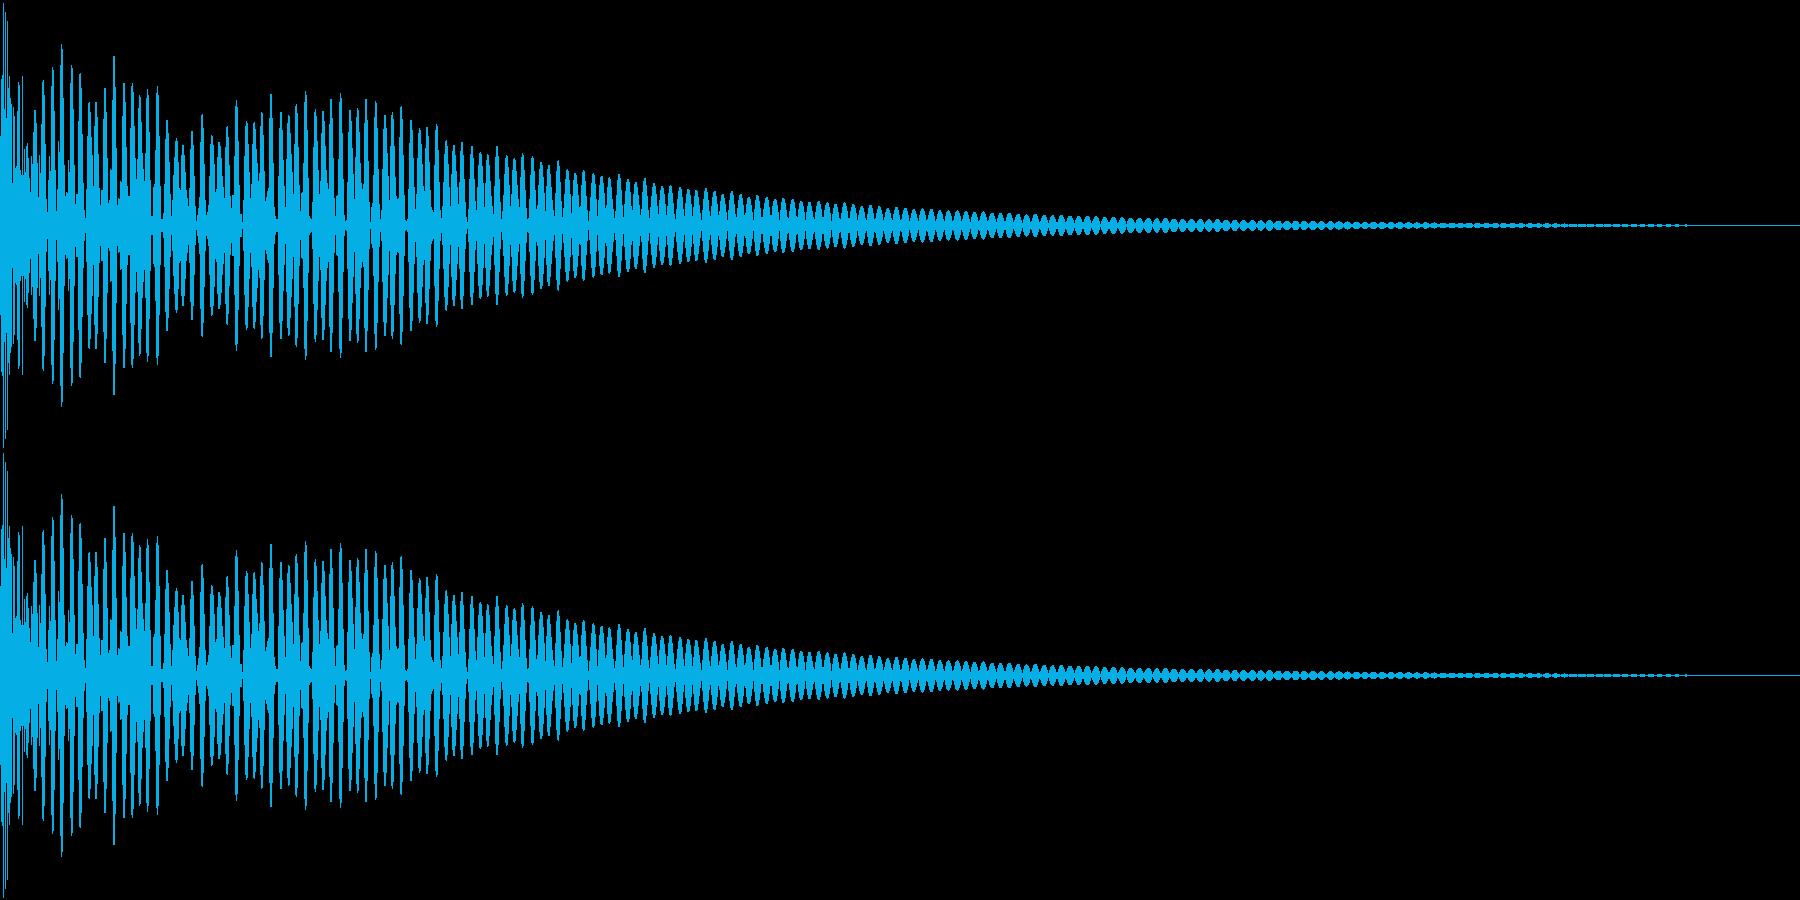 DTM Tom 12 オリジナル音源の再生済みの波形